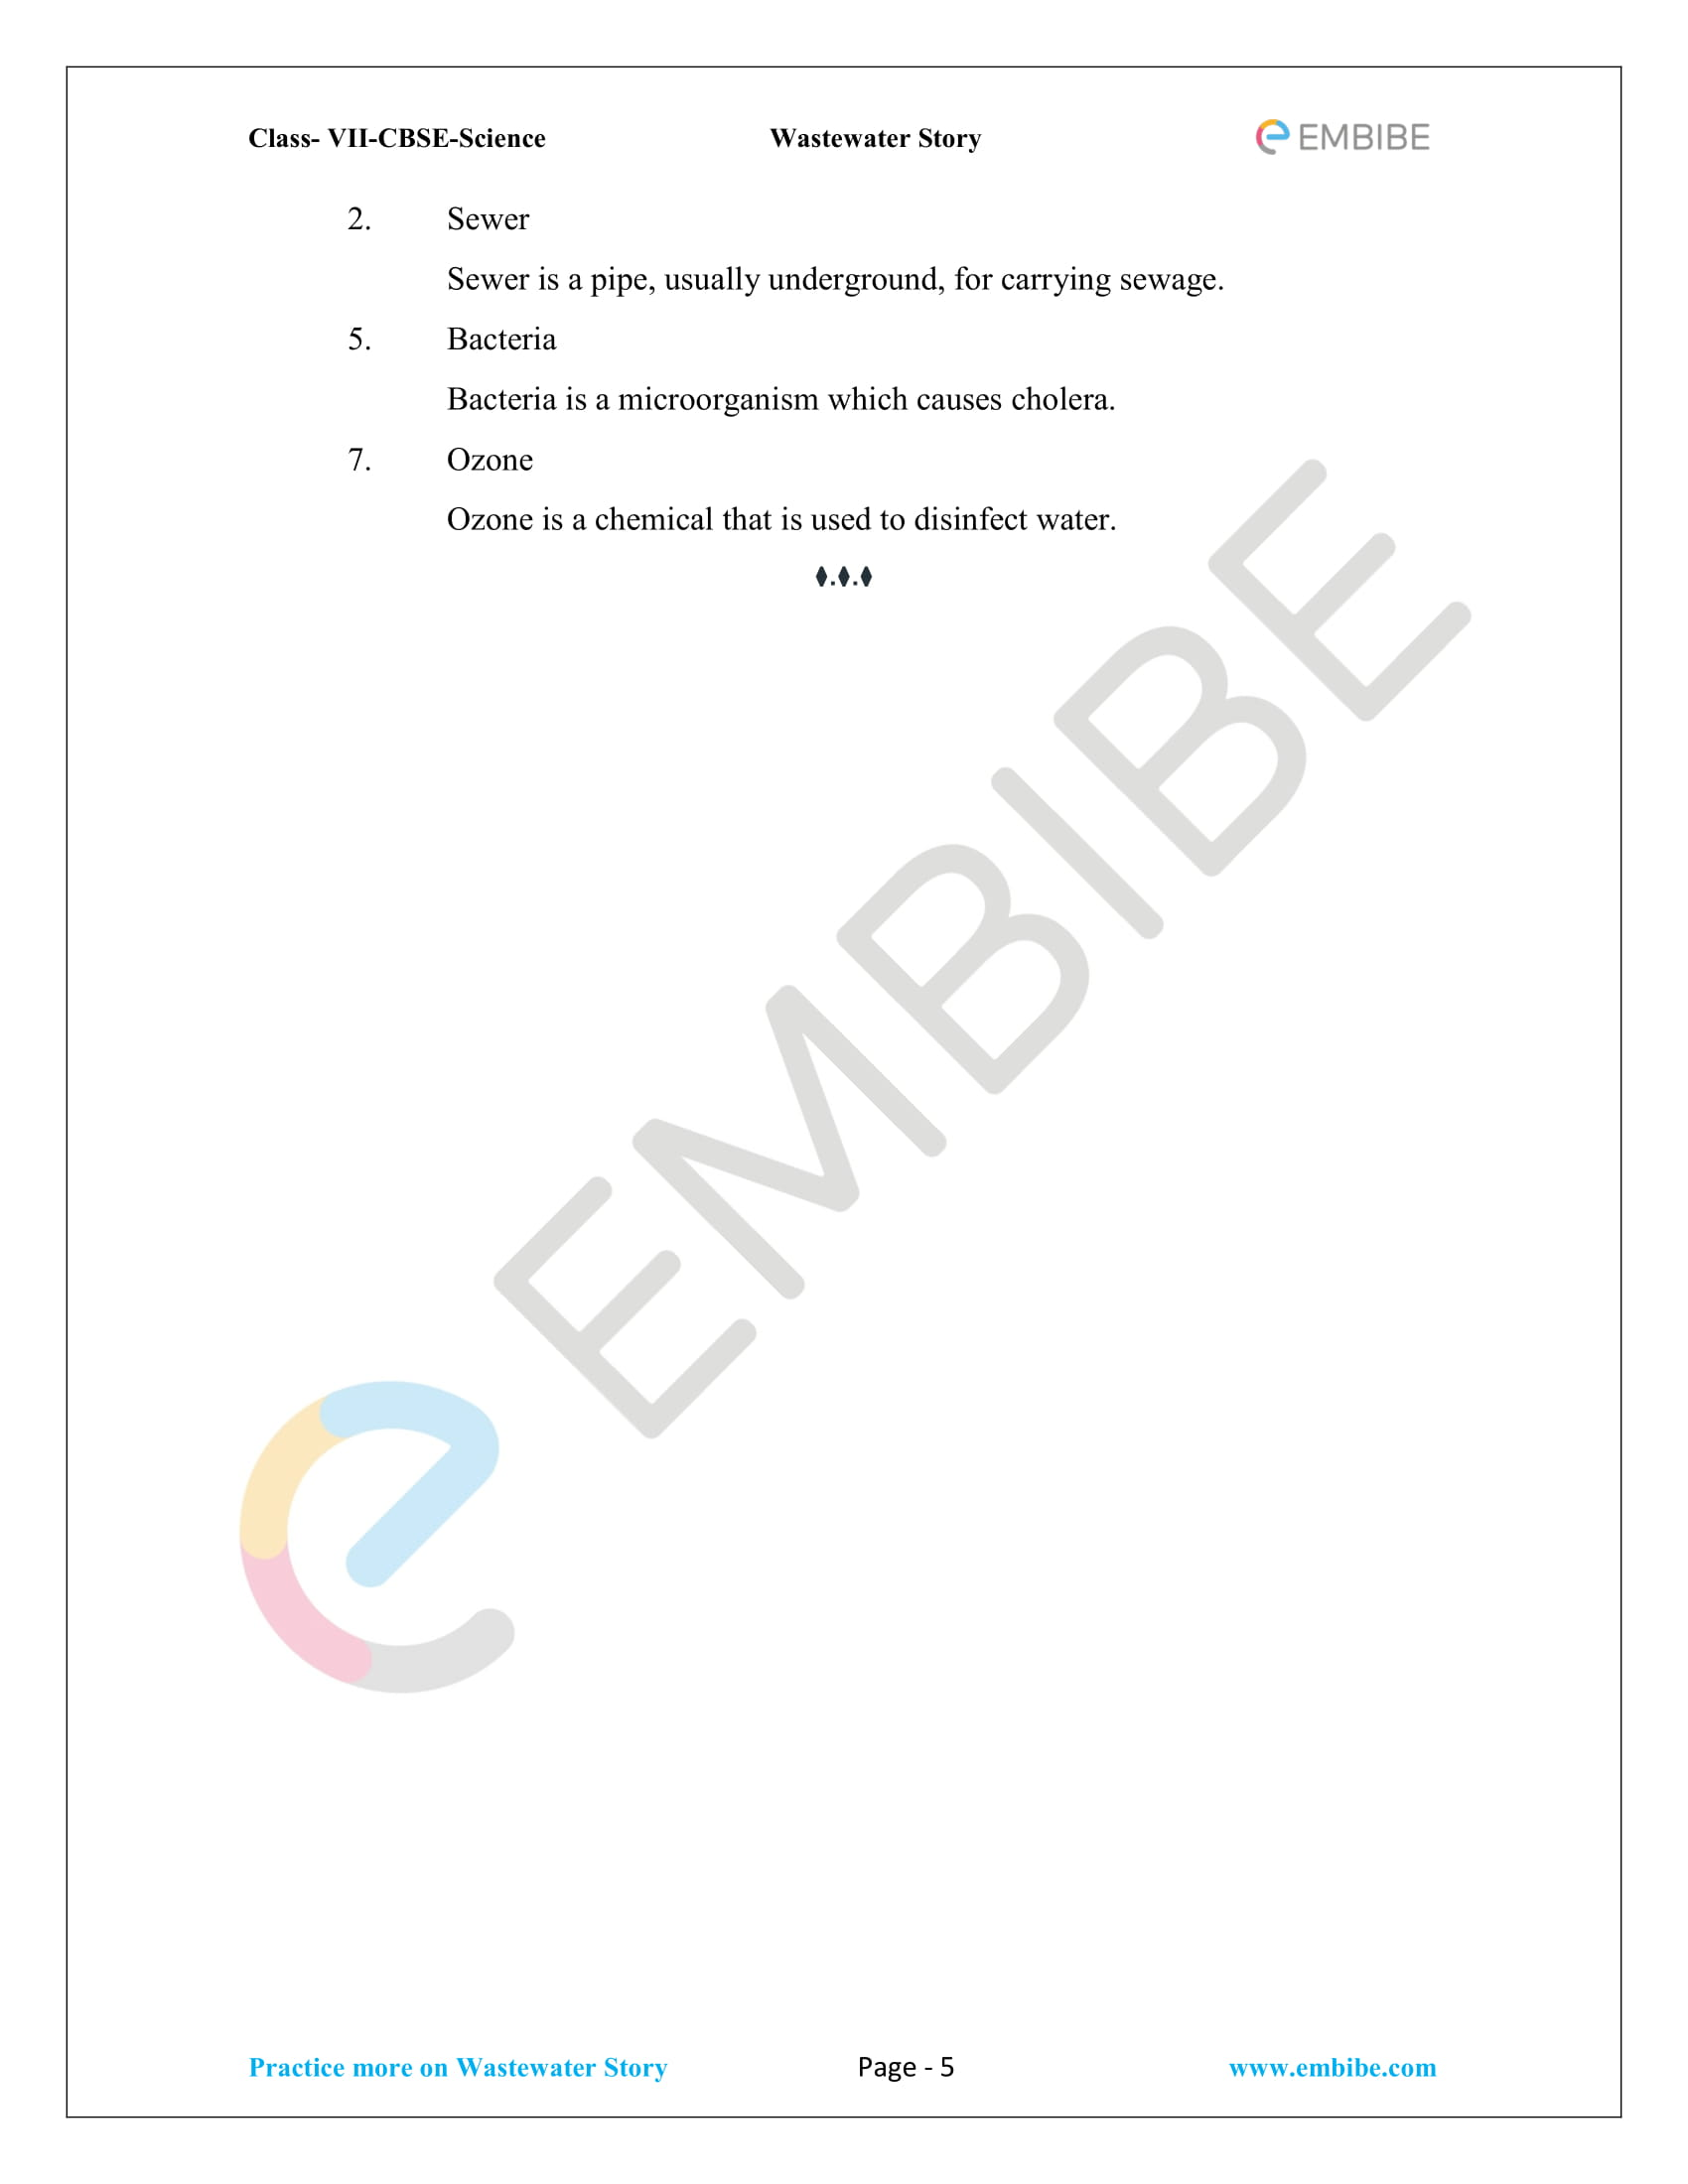 Class 2 Wastewater Practice Exam